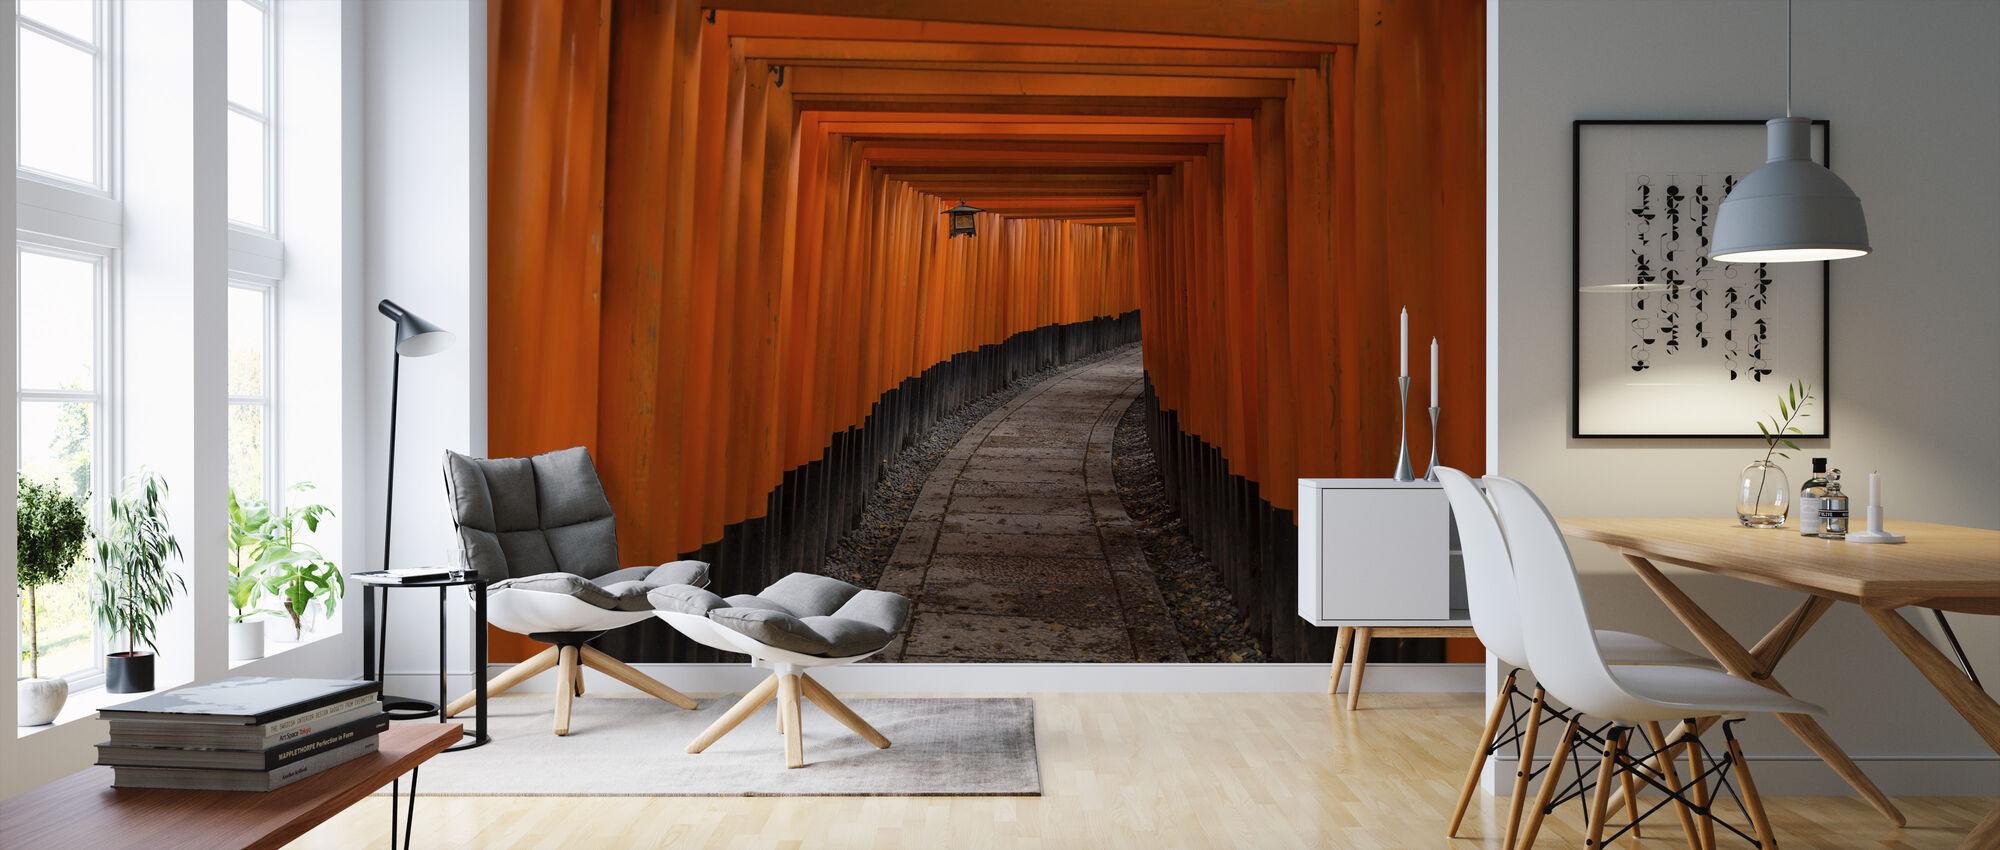 Japan Tunnel - Wallpaper - Living Room